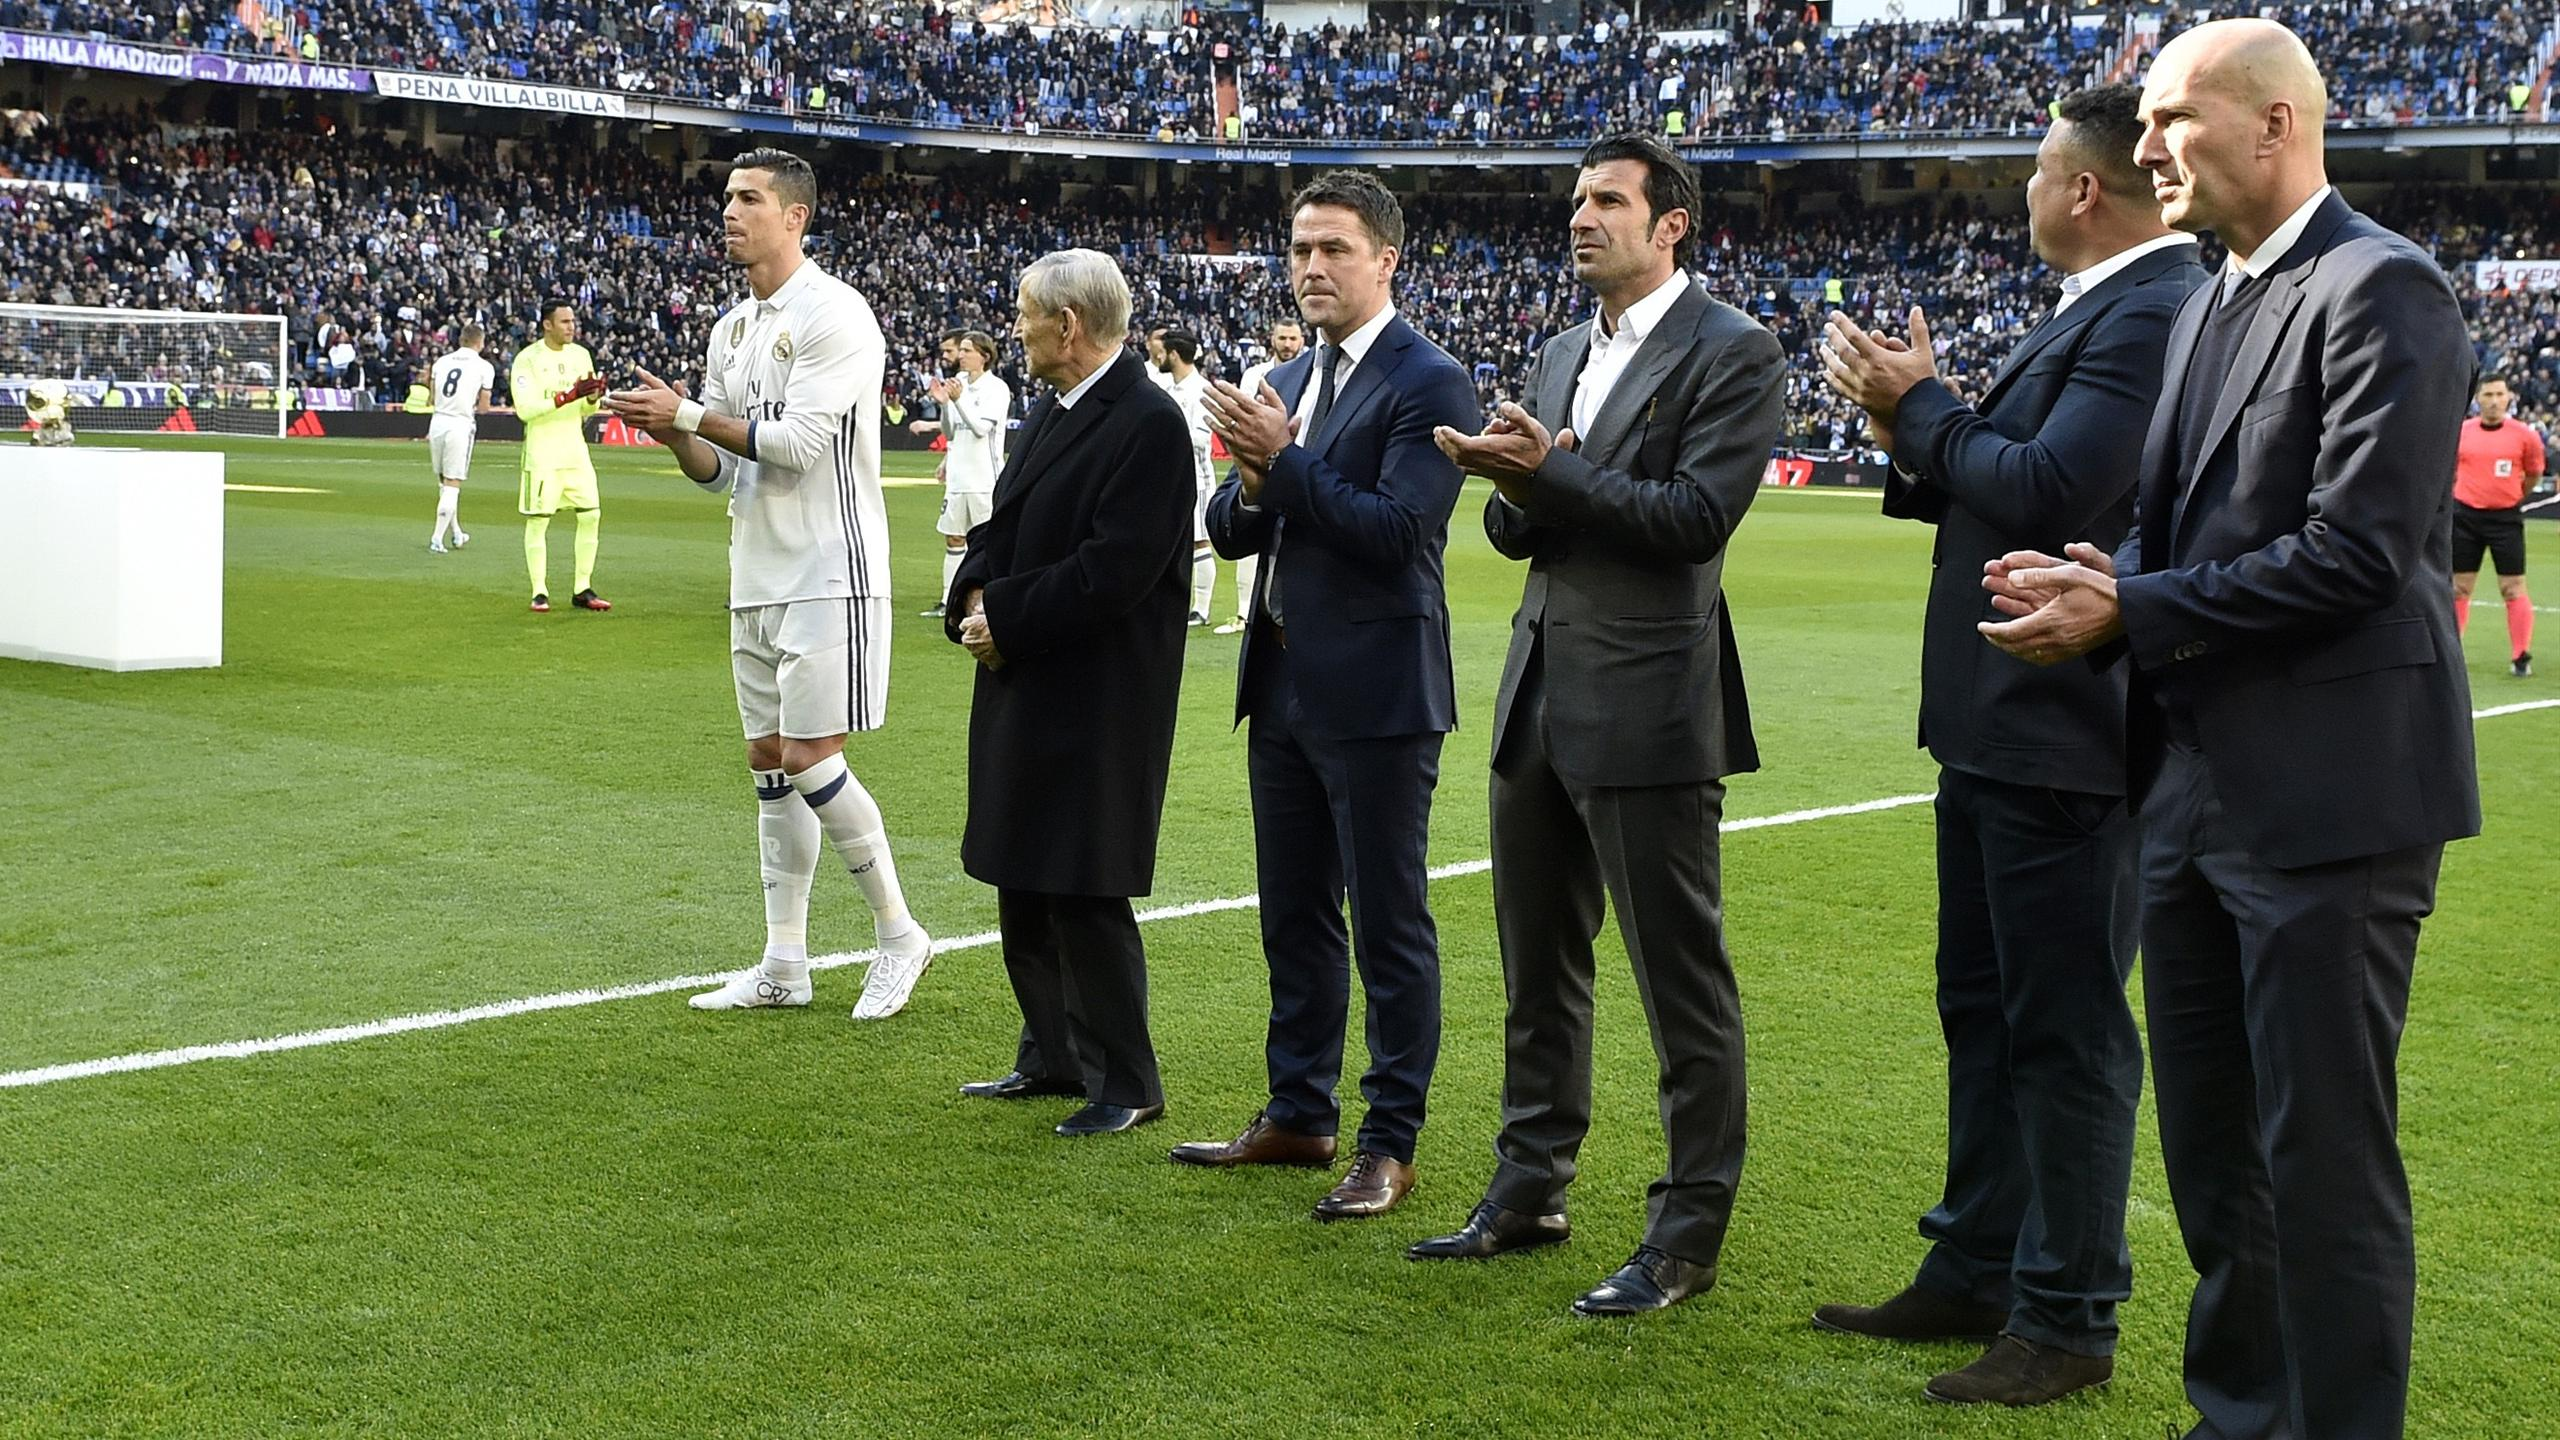 Real Madrid's Portuguese forward Cristiano Ronaldo, former football players French Raymond Kopa, British Michael Owen, Portuguese Luis Figo, Brazilianb Ronaldo Nazario and Real Madrid's French coach Zinedine Zidane